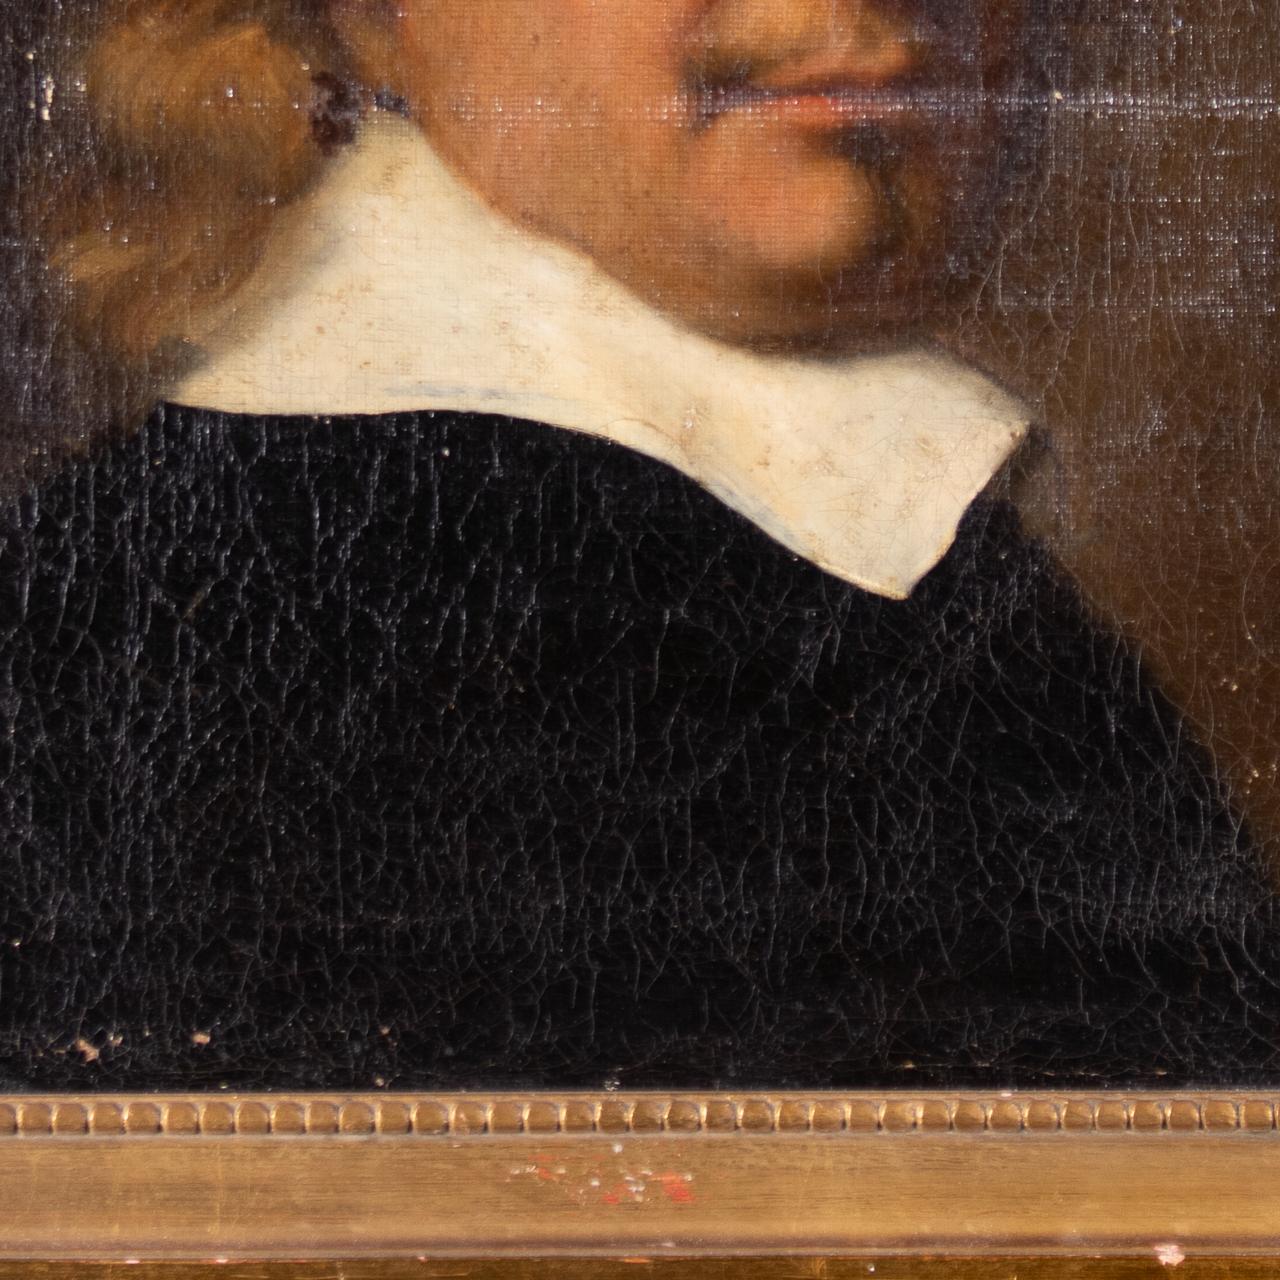 XVII Old Master Portrait - Cardinal - Image 12 of 12